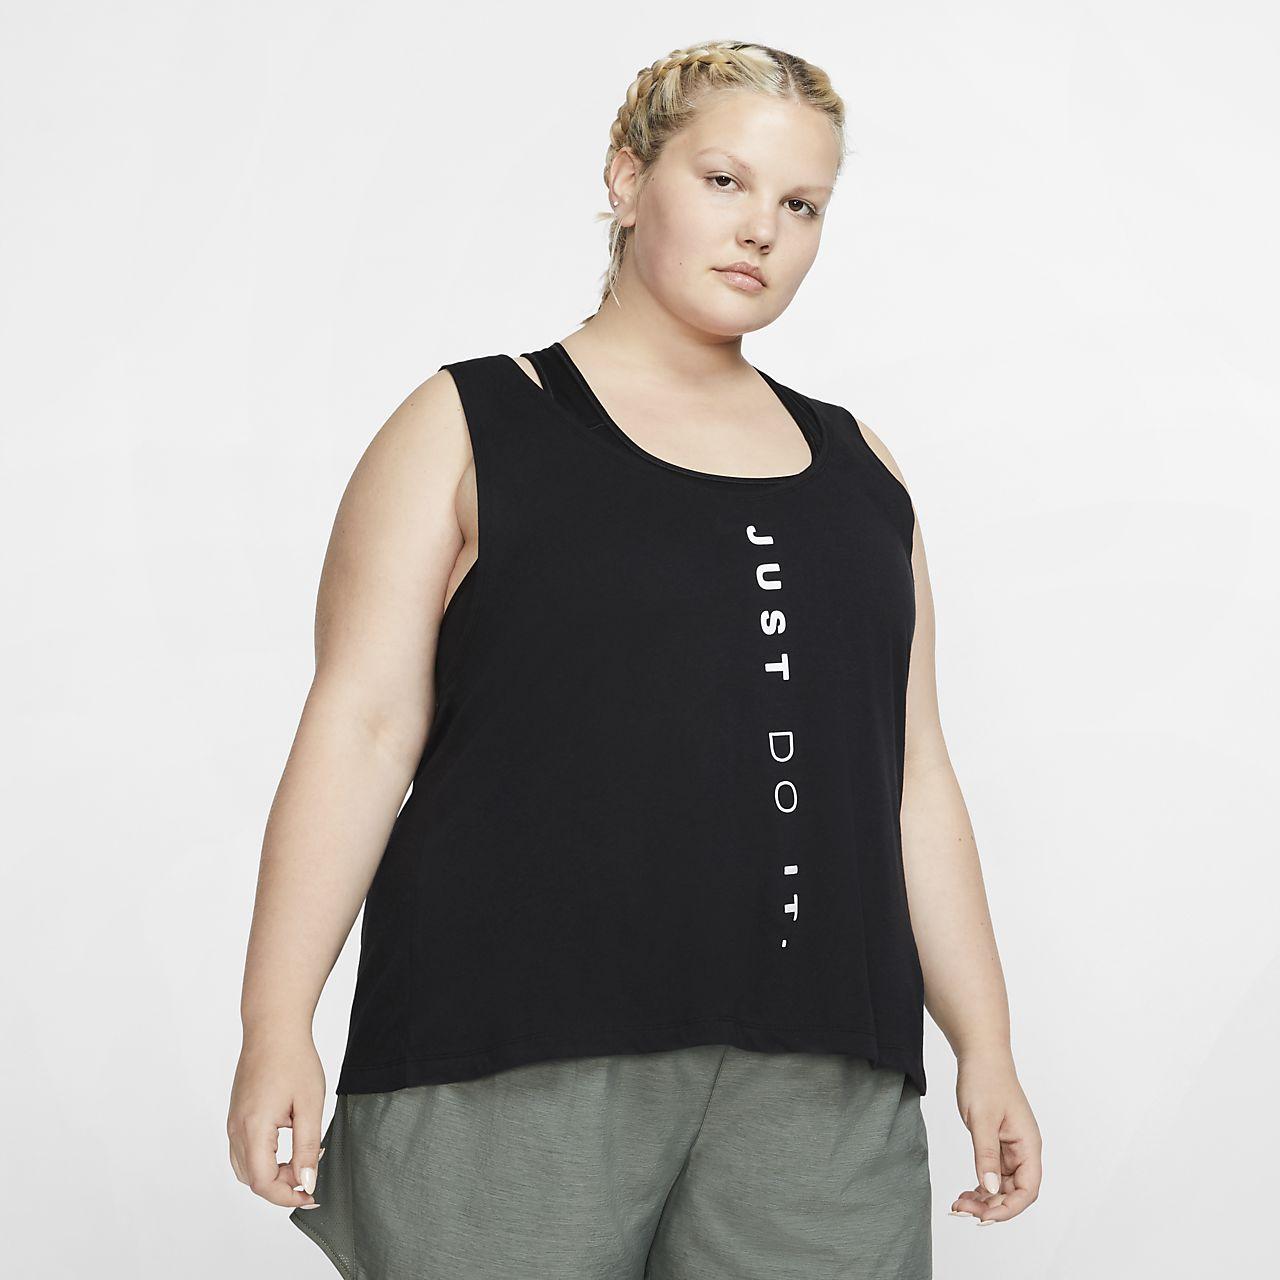 8c5a03acba3fe Nike Dri-FIT Miler Women s Running Tank (Plus Size). Nike.com